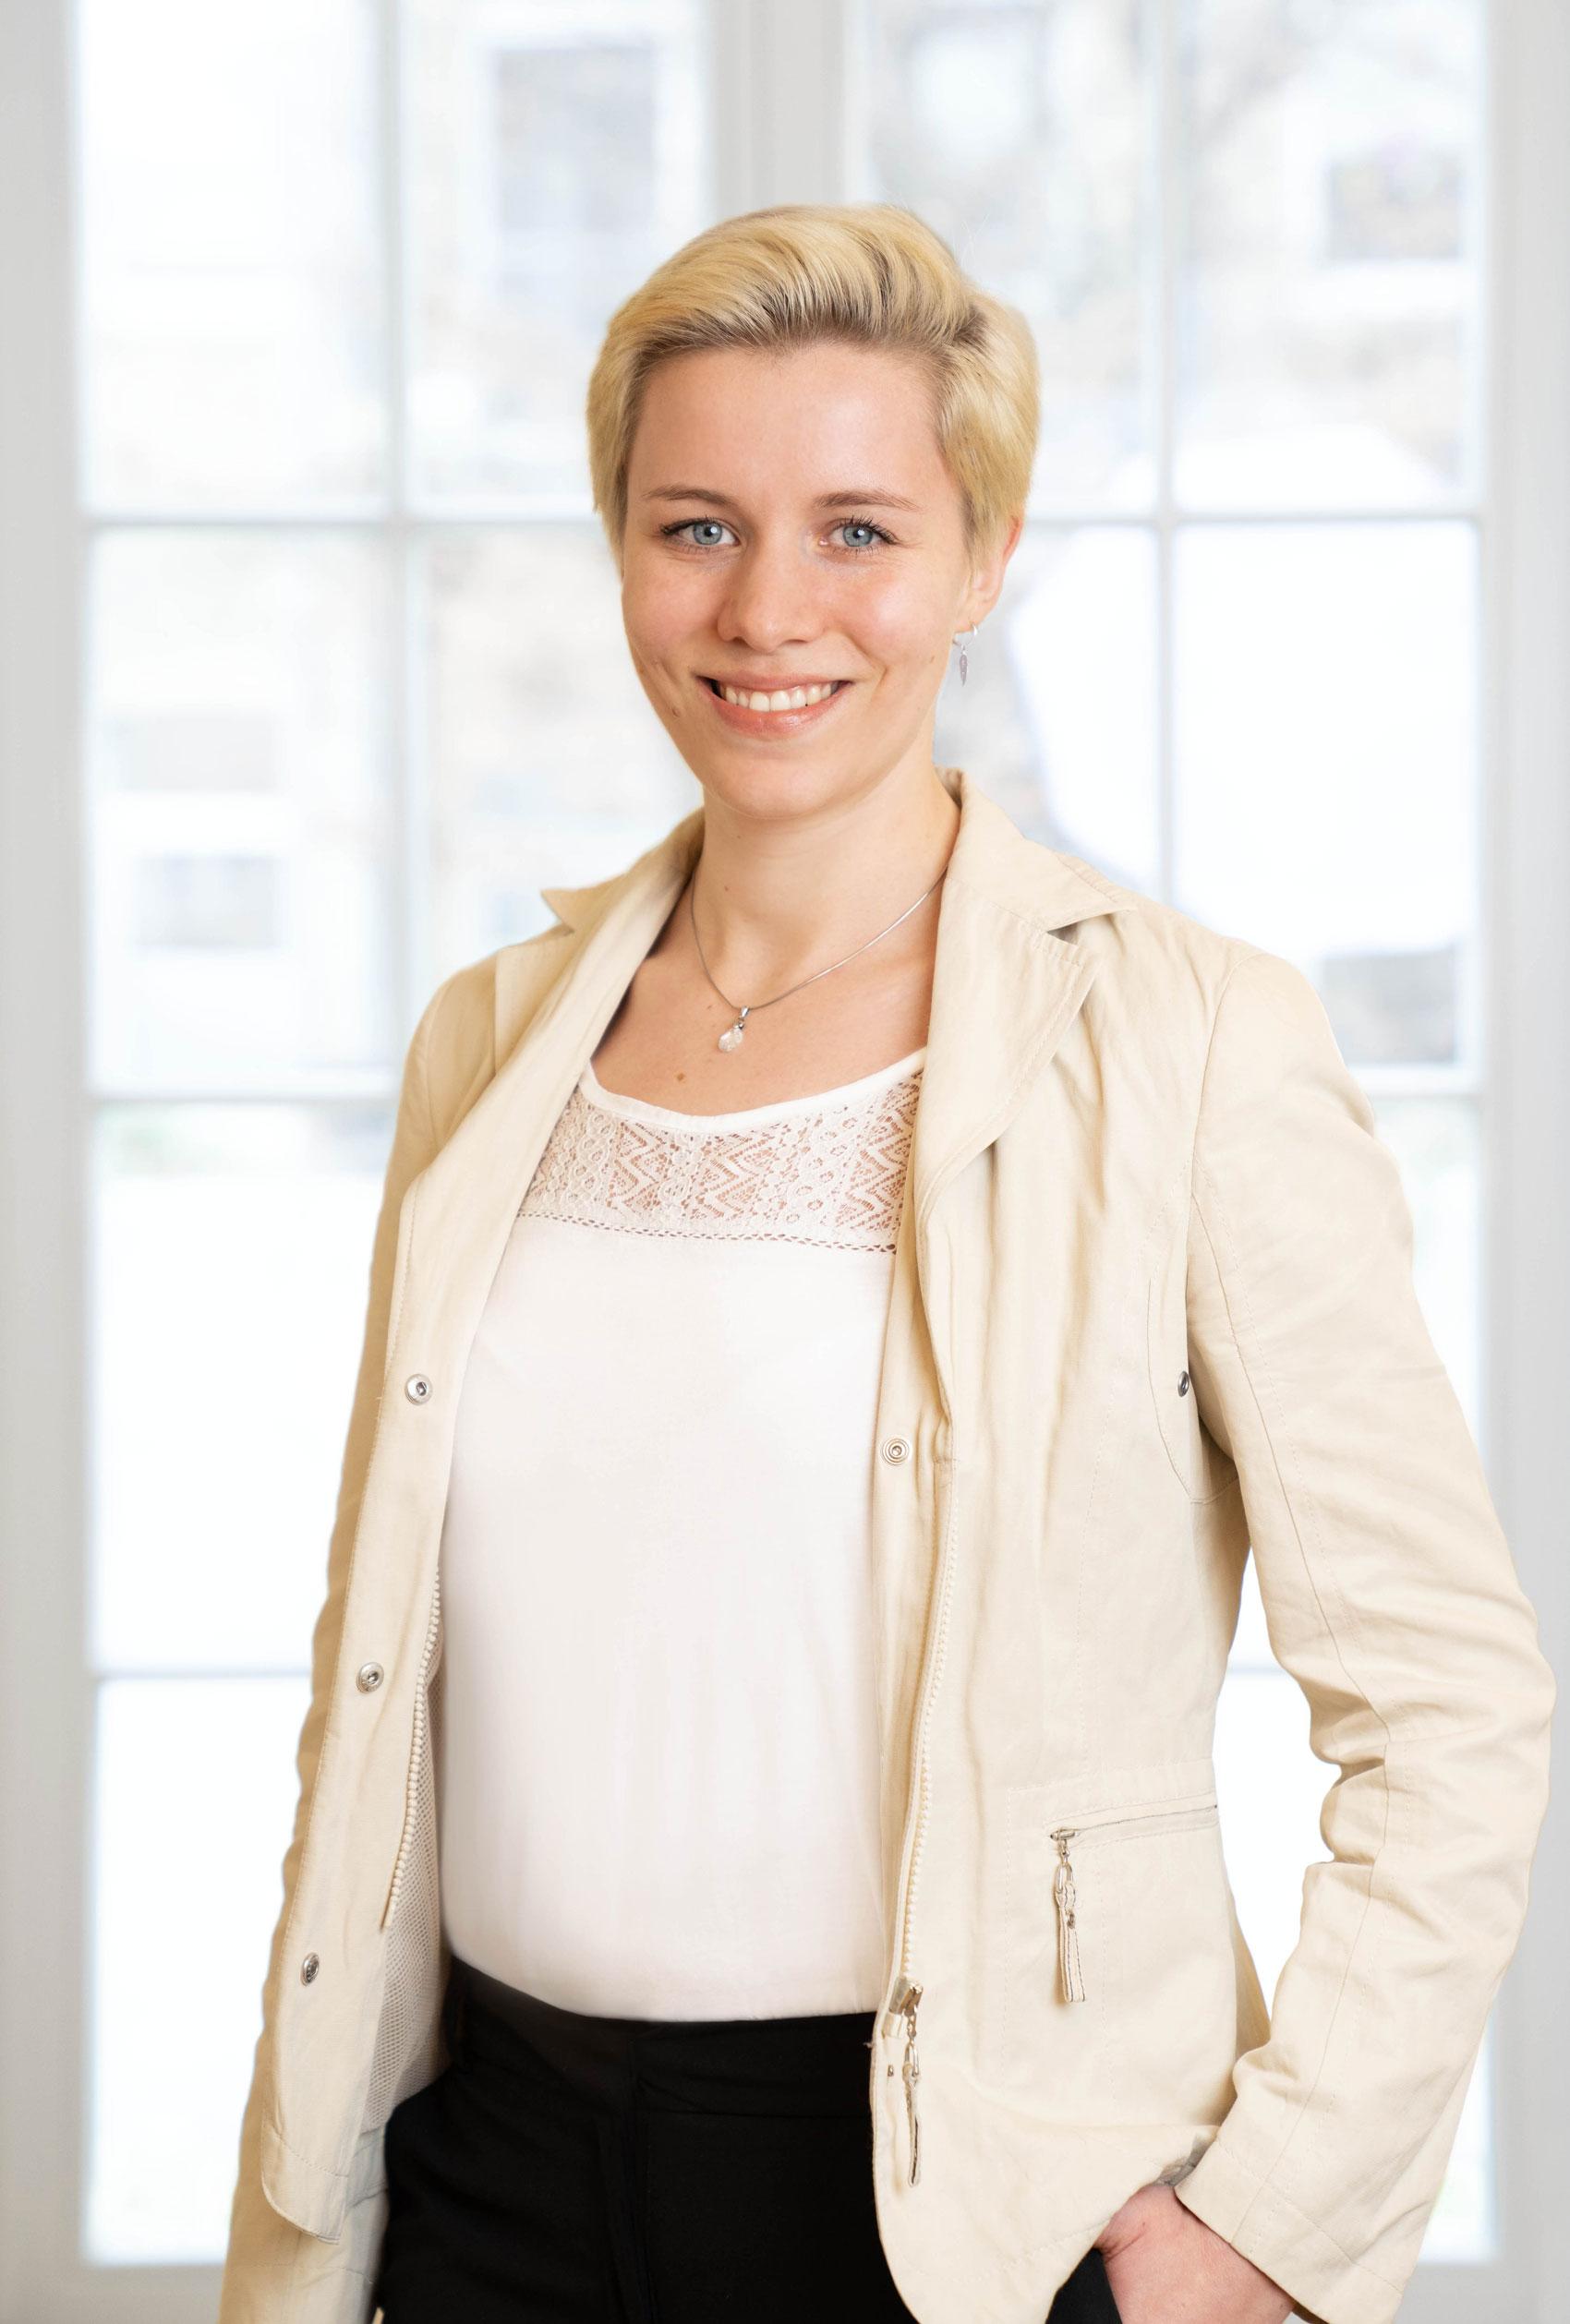 Judith Grabowski